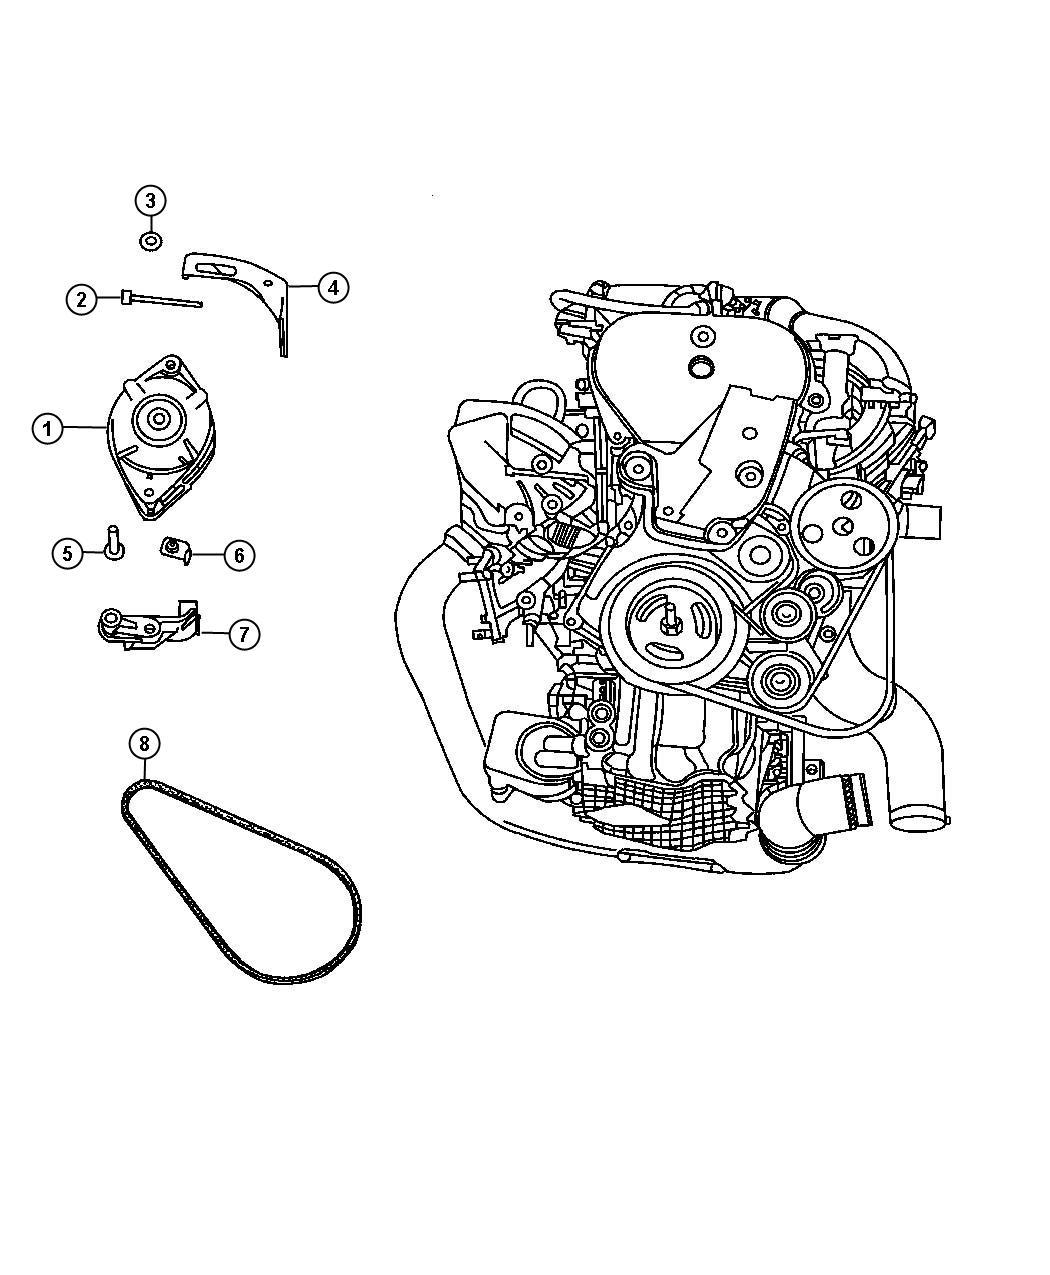 Alternator 2 4l 2 4l 4 Cyl Dohc 16v Turbo Engine Dohc